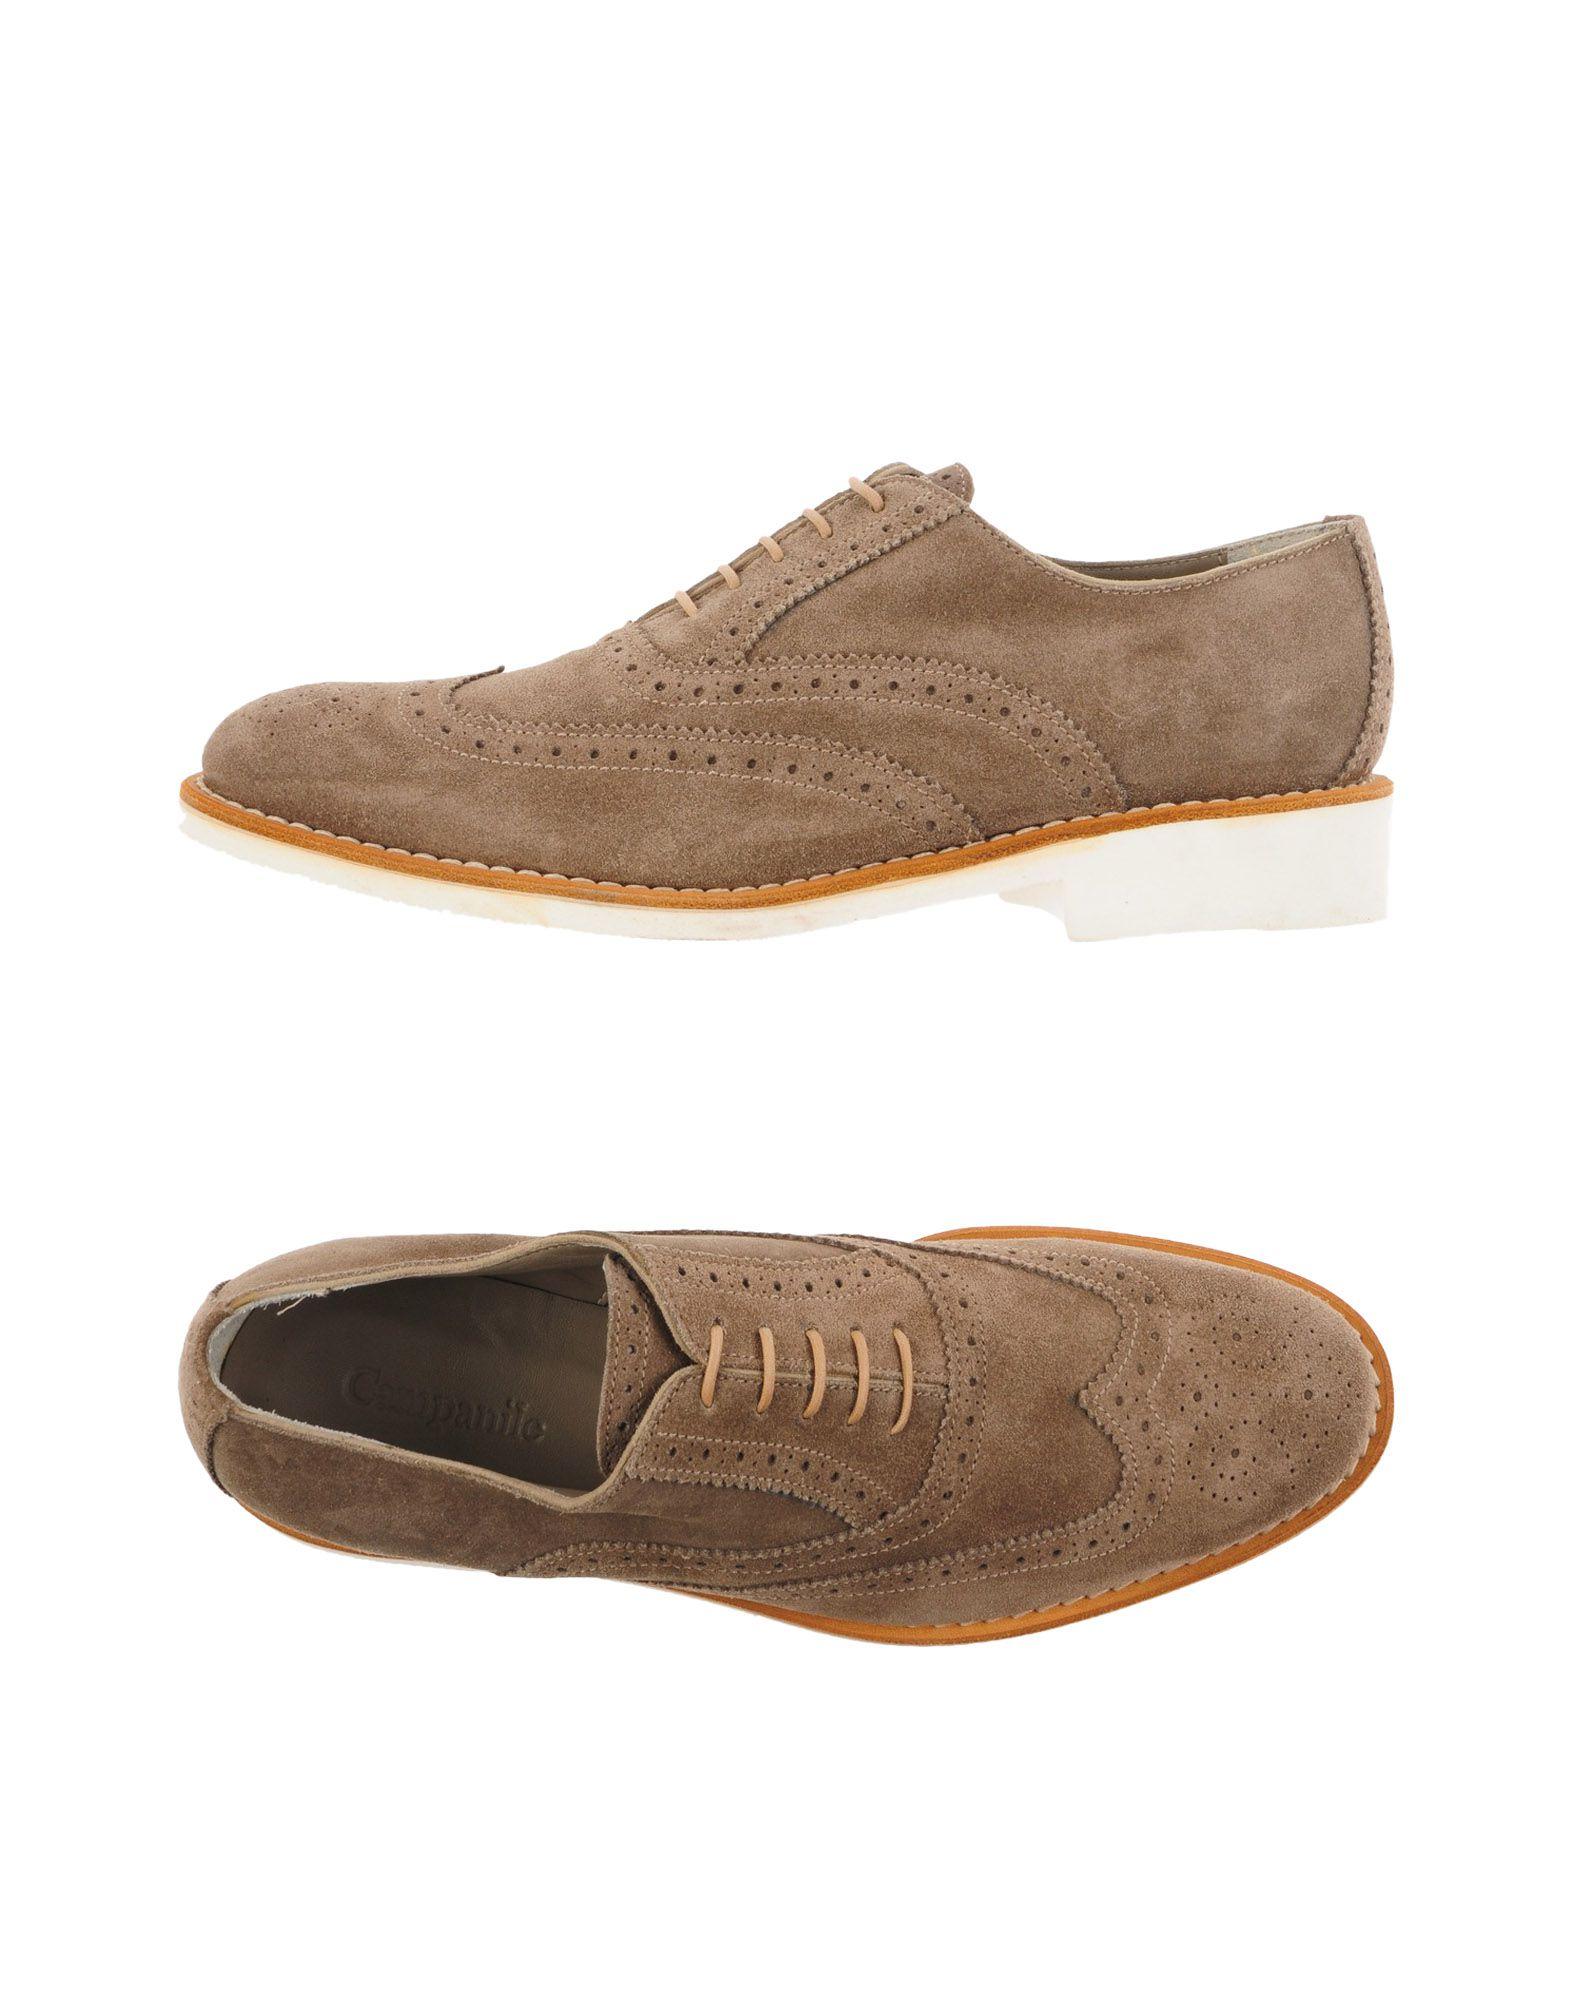 CAMPANILE Laced Shoes in Khaki